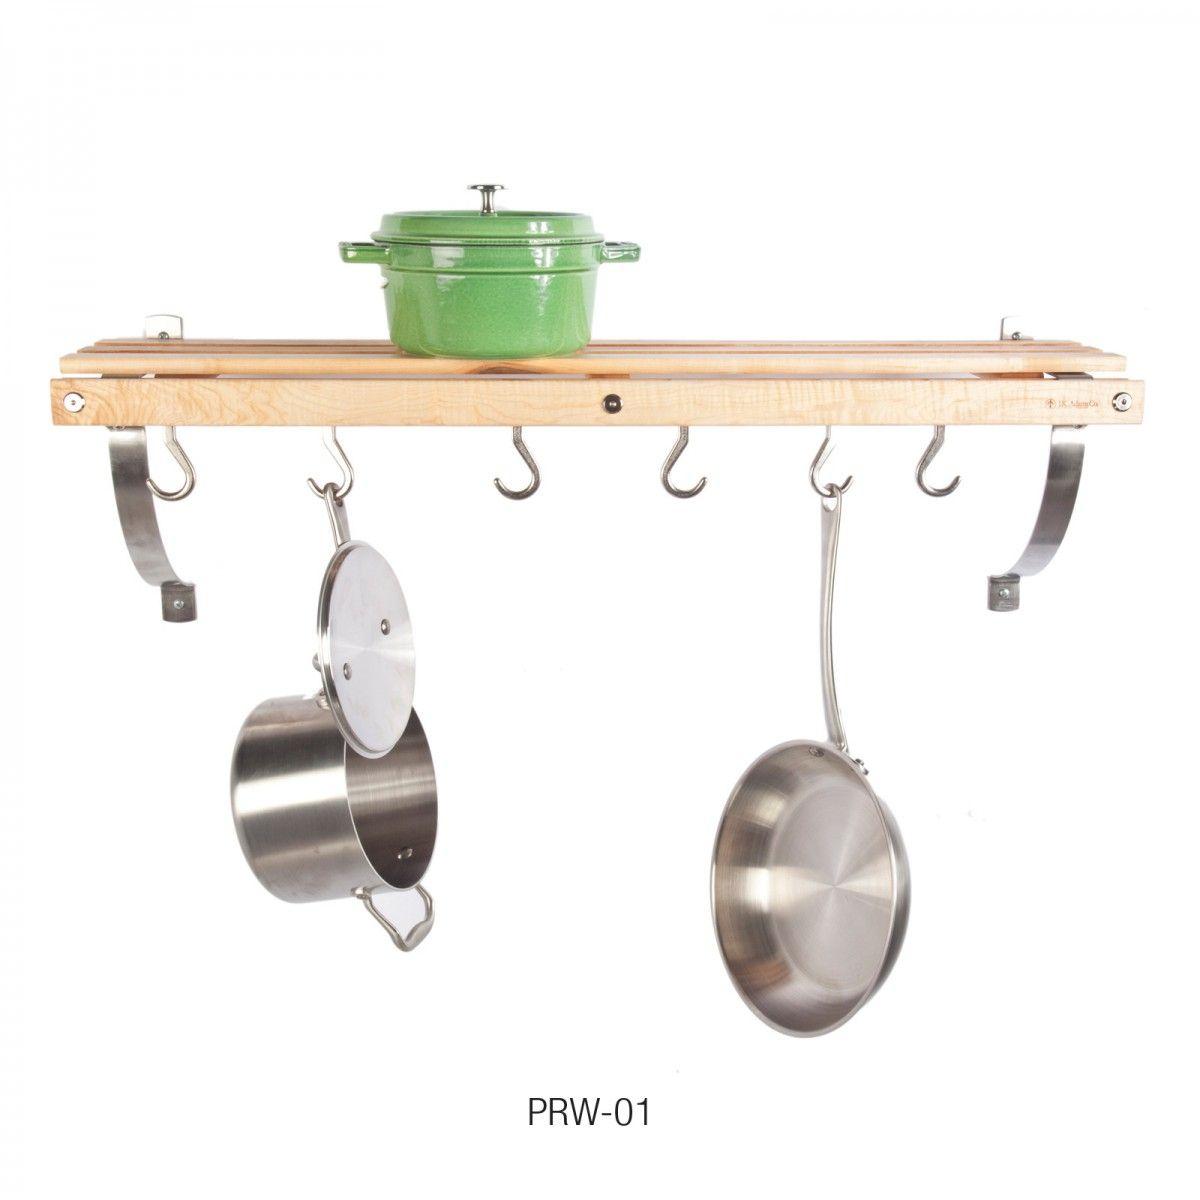 Wall mounted Pot Rack, Six Pot Hooks, Natural